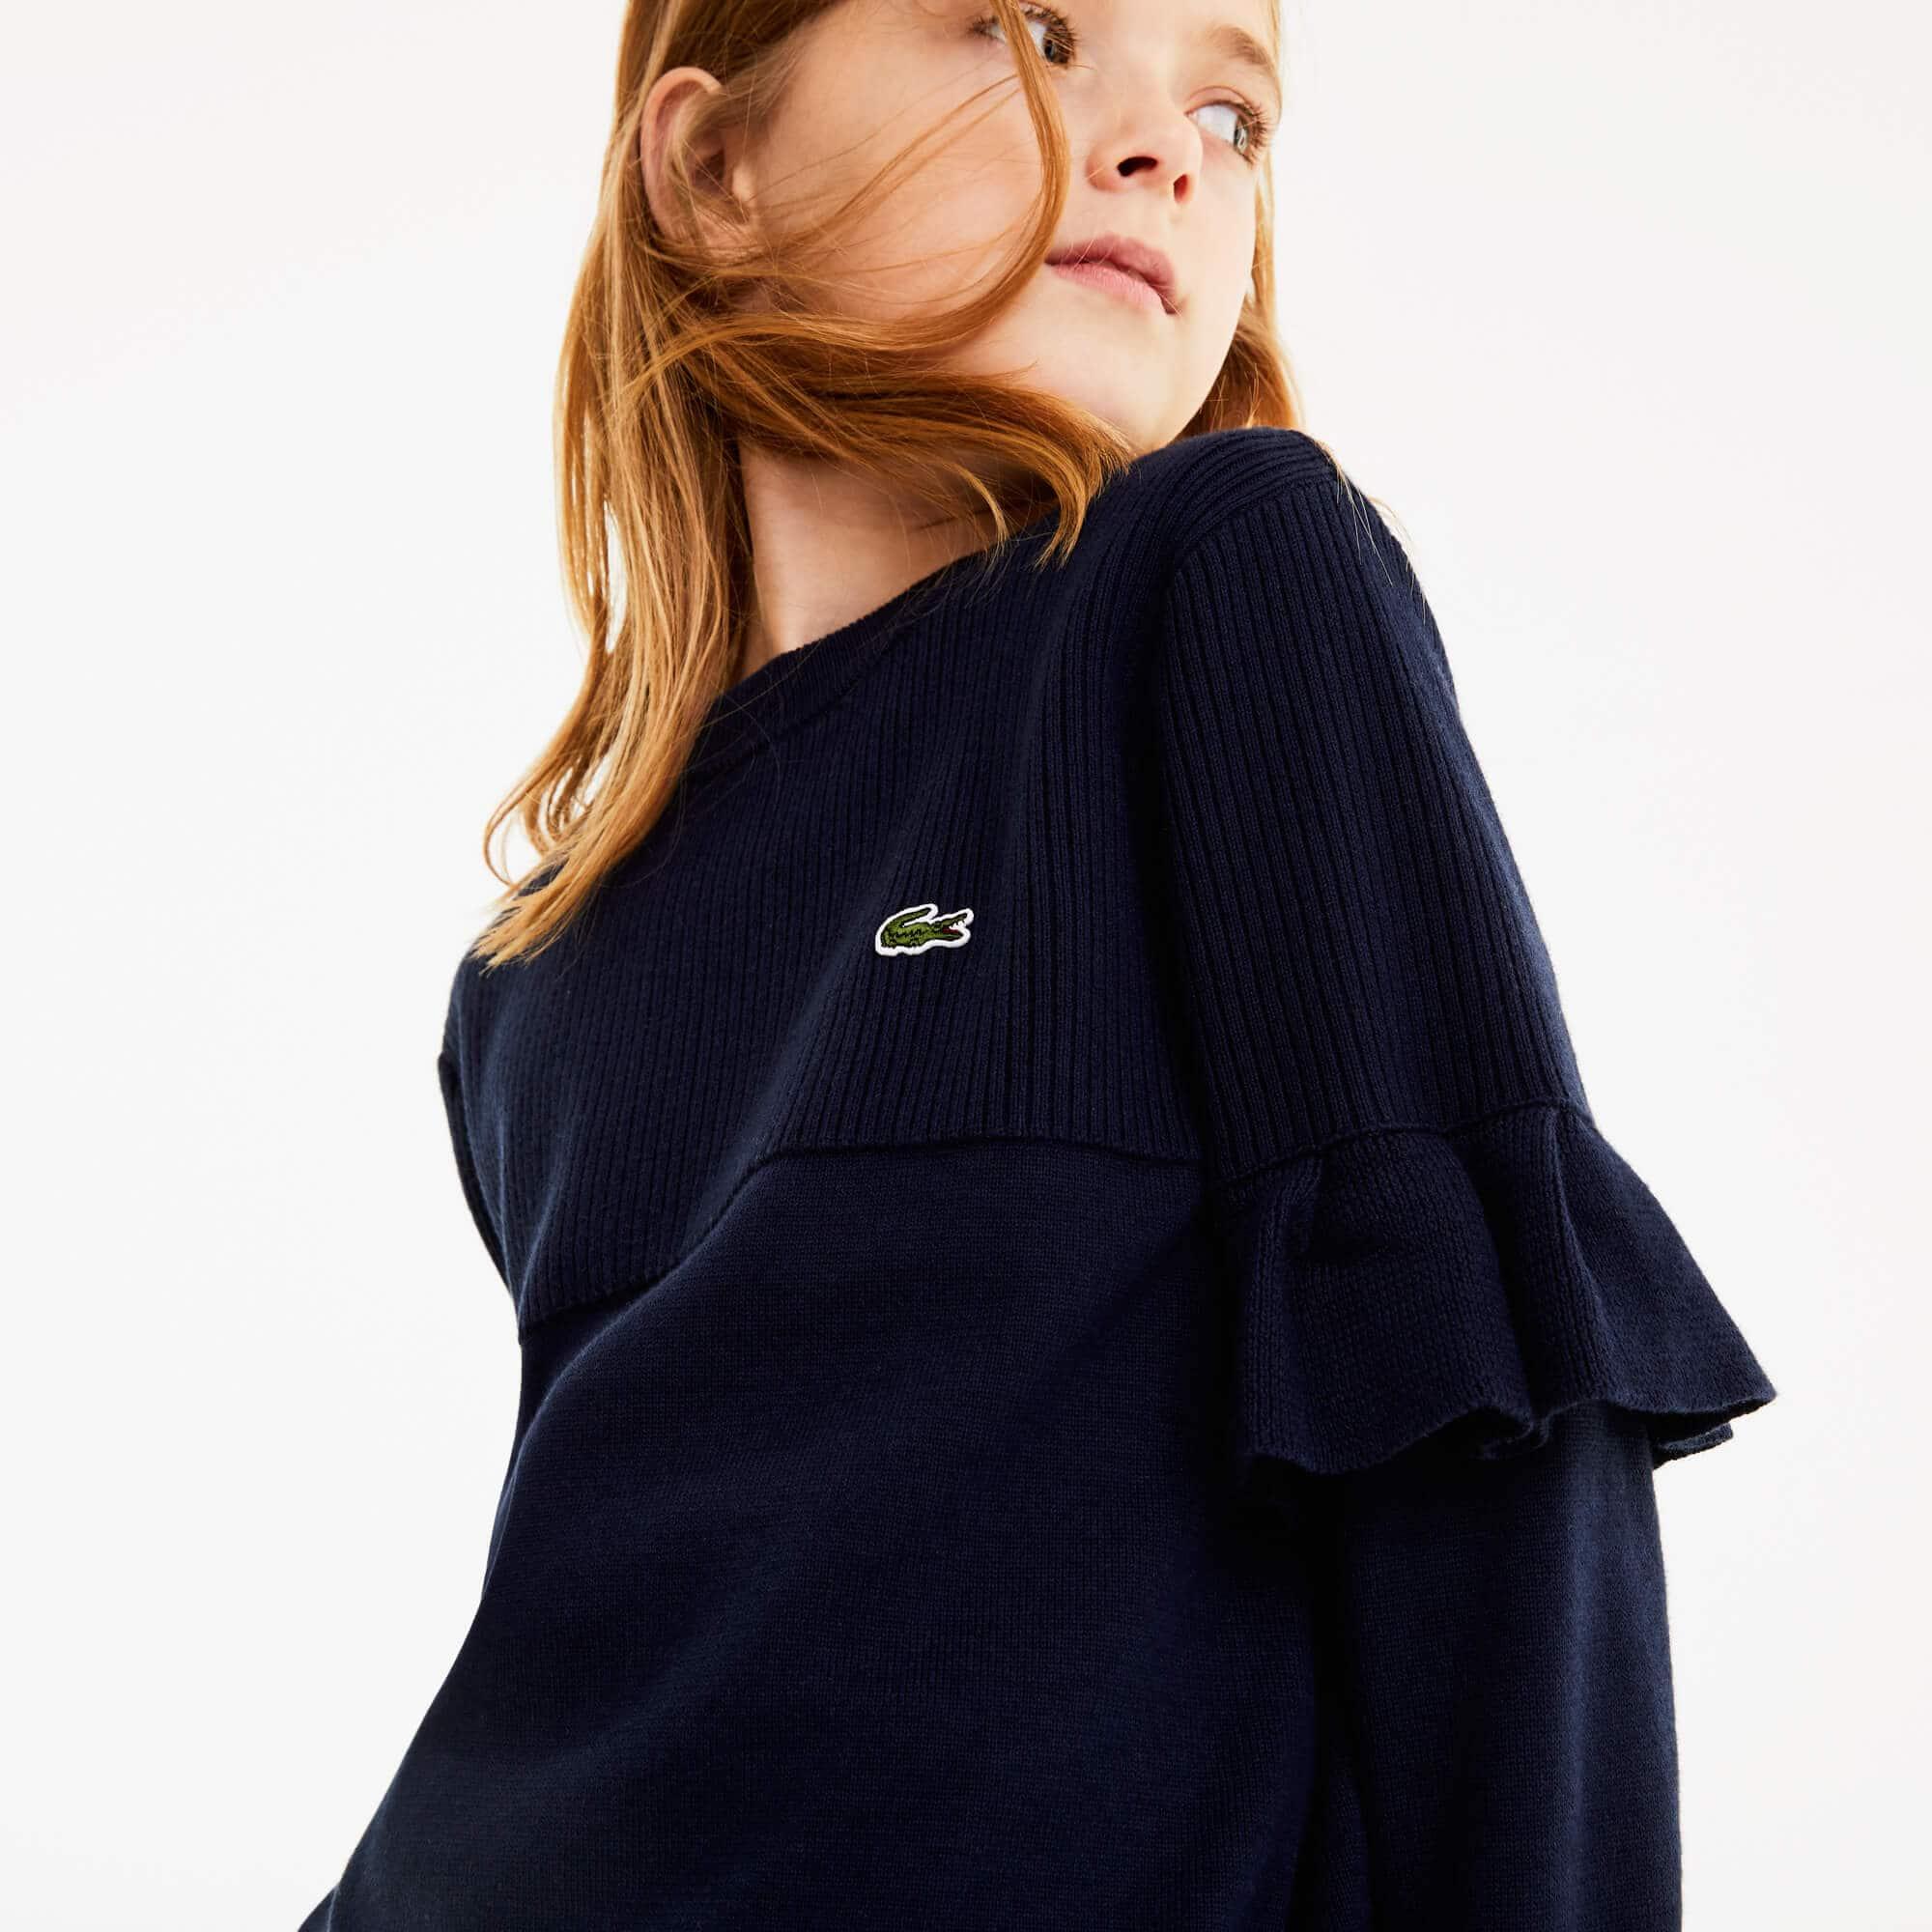 Lacoste Girls Ruffled Sleeves Sweater